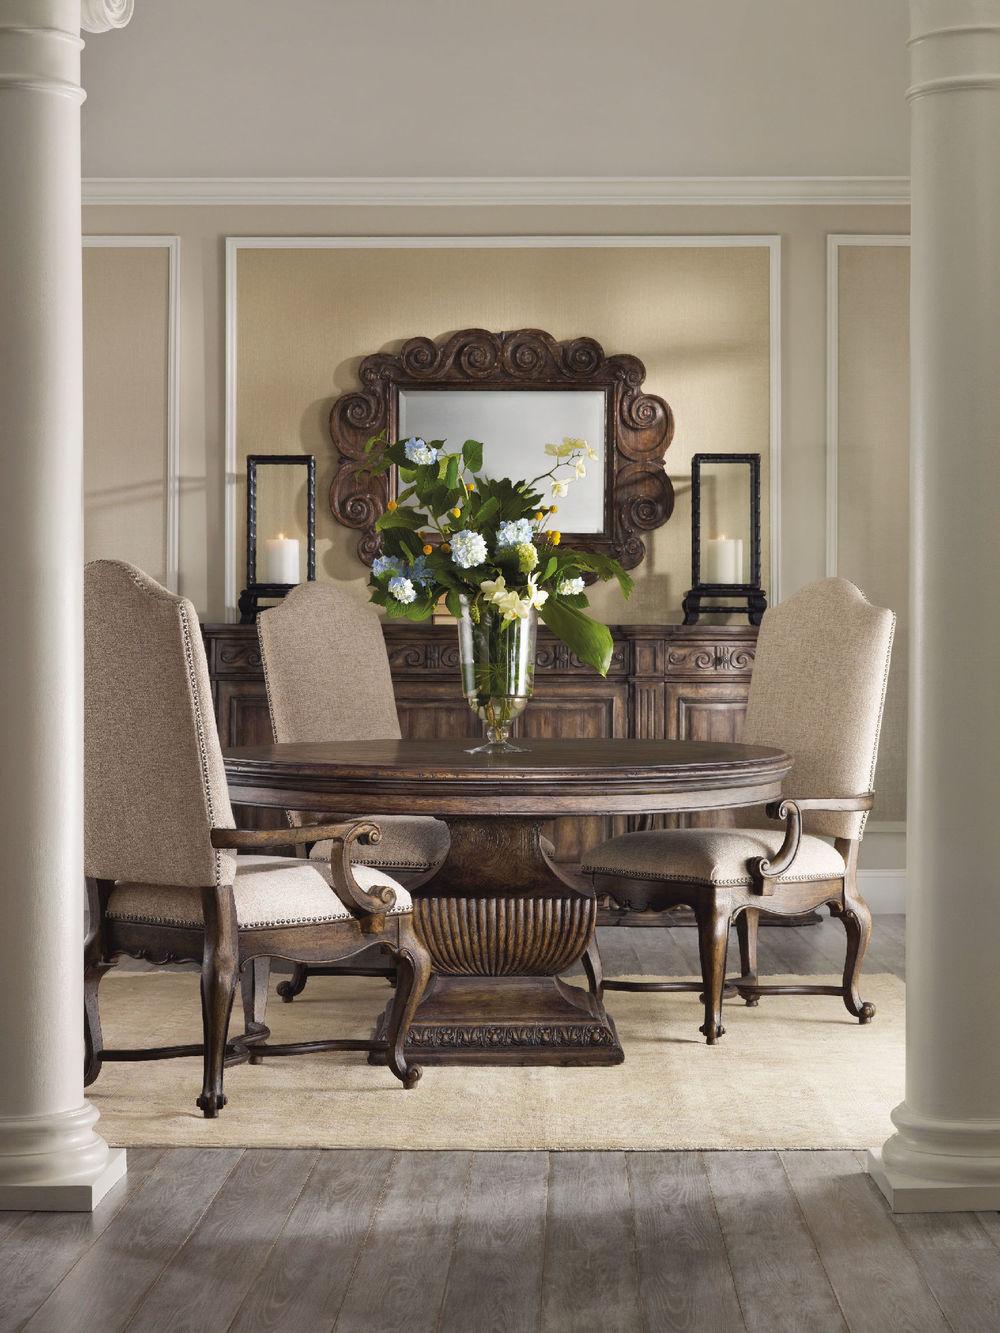 Hooker Furniture - Rhapsody Upholstered Side Chair